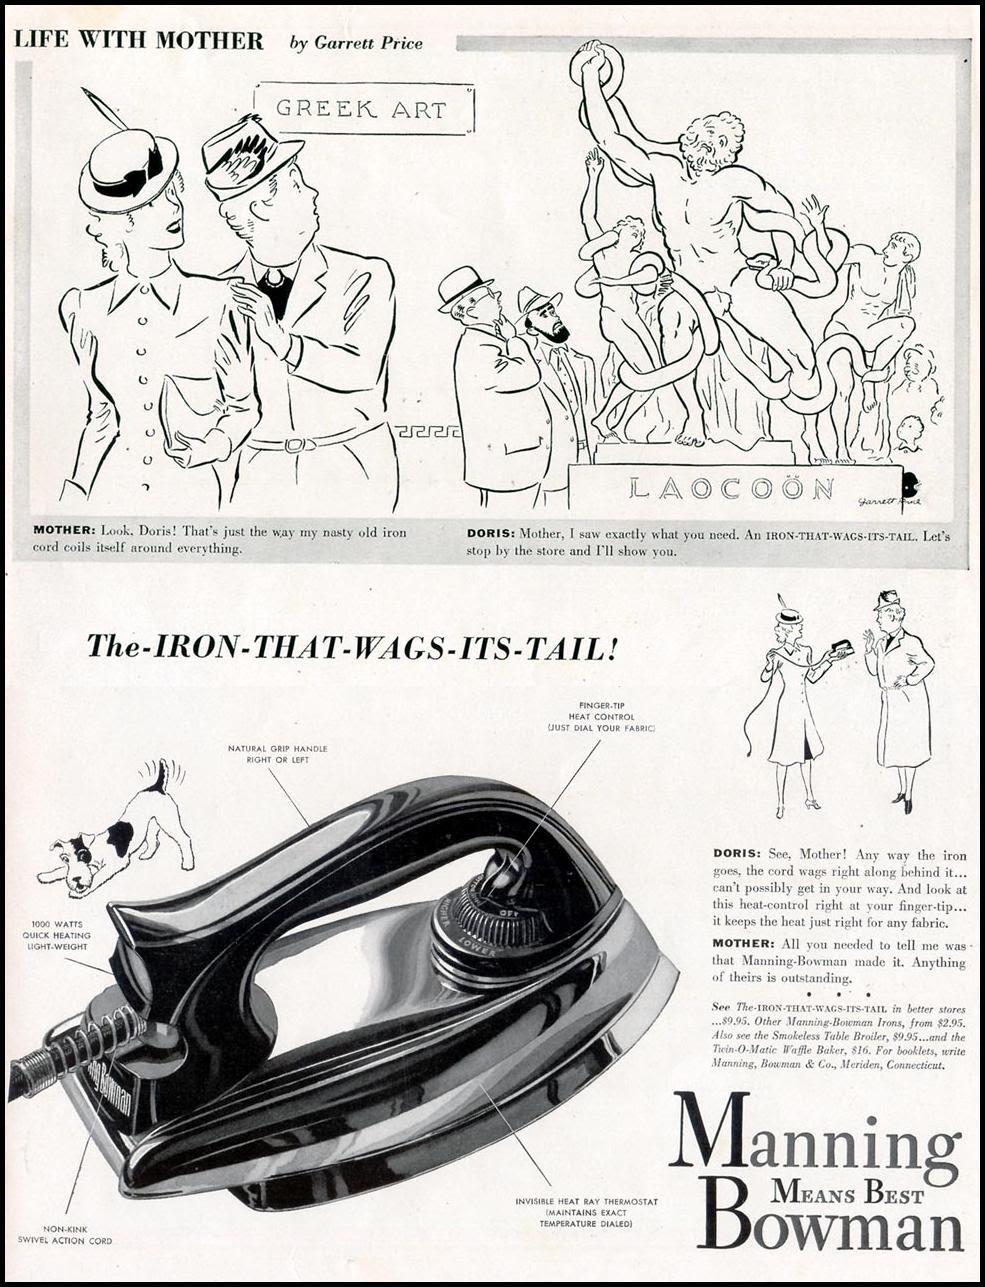 MANNING BOWMAN IRONS LIFE 09/30/1940 p. 15